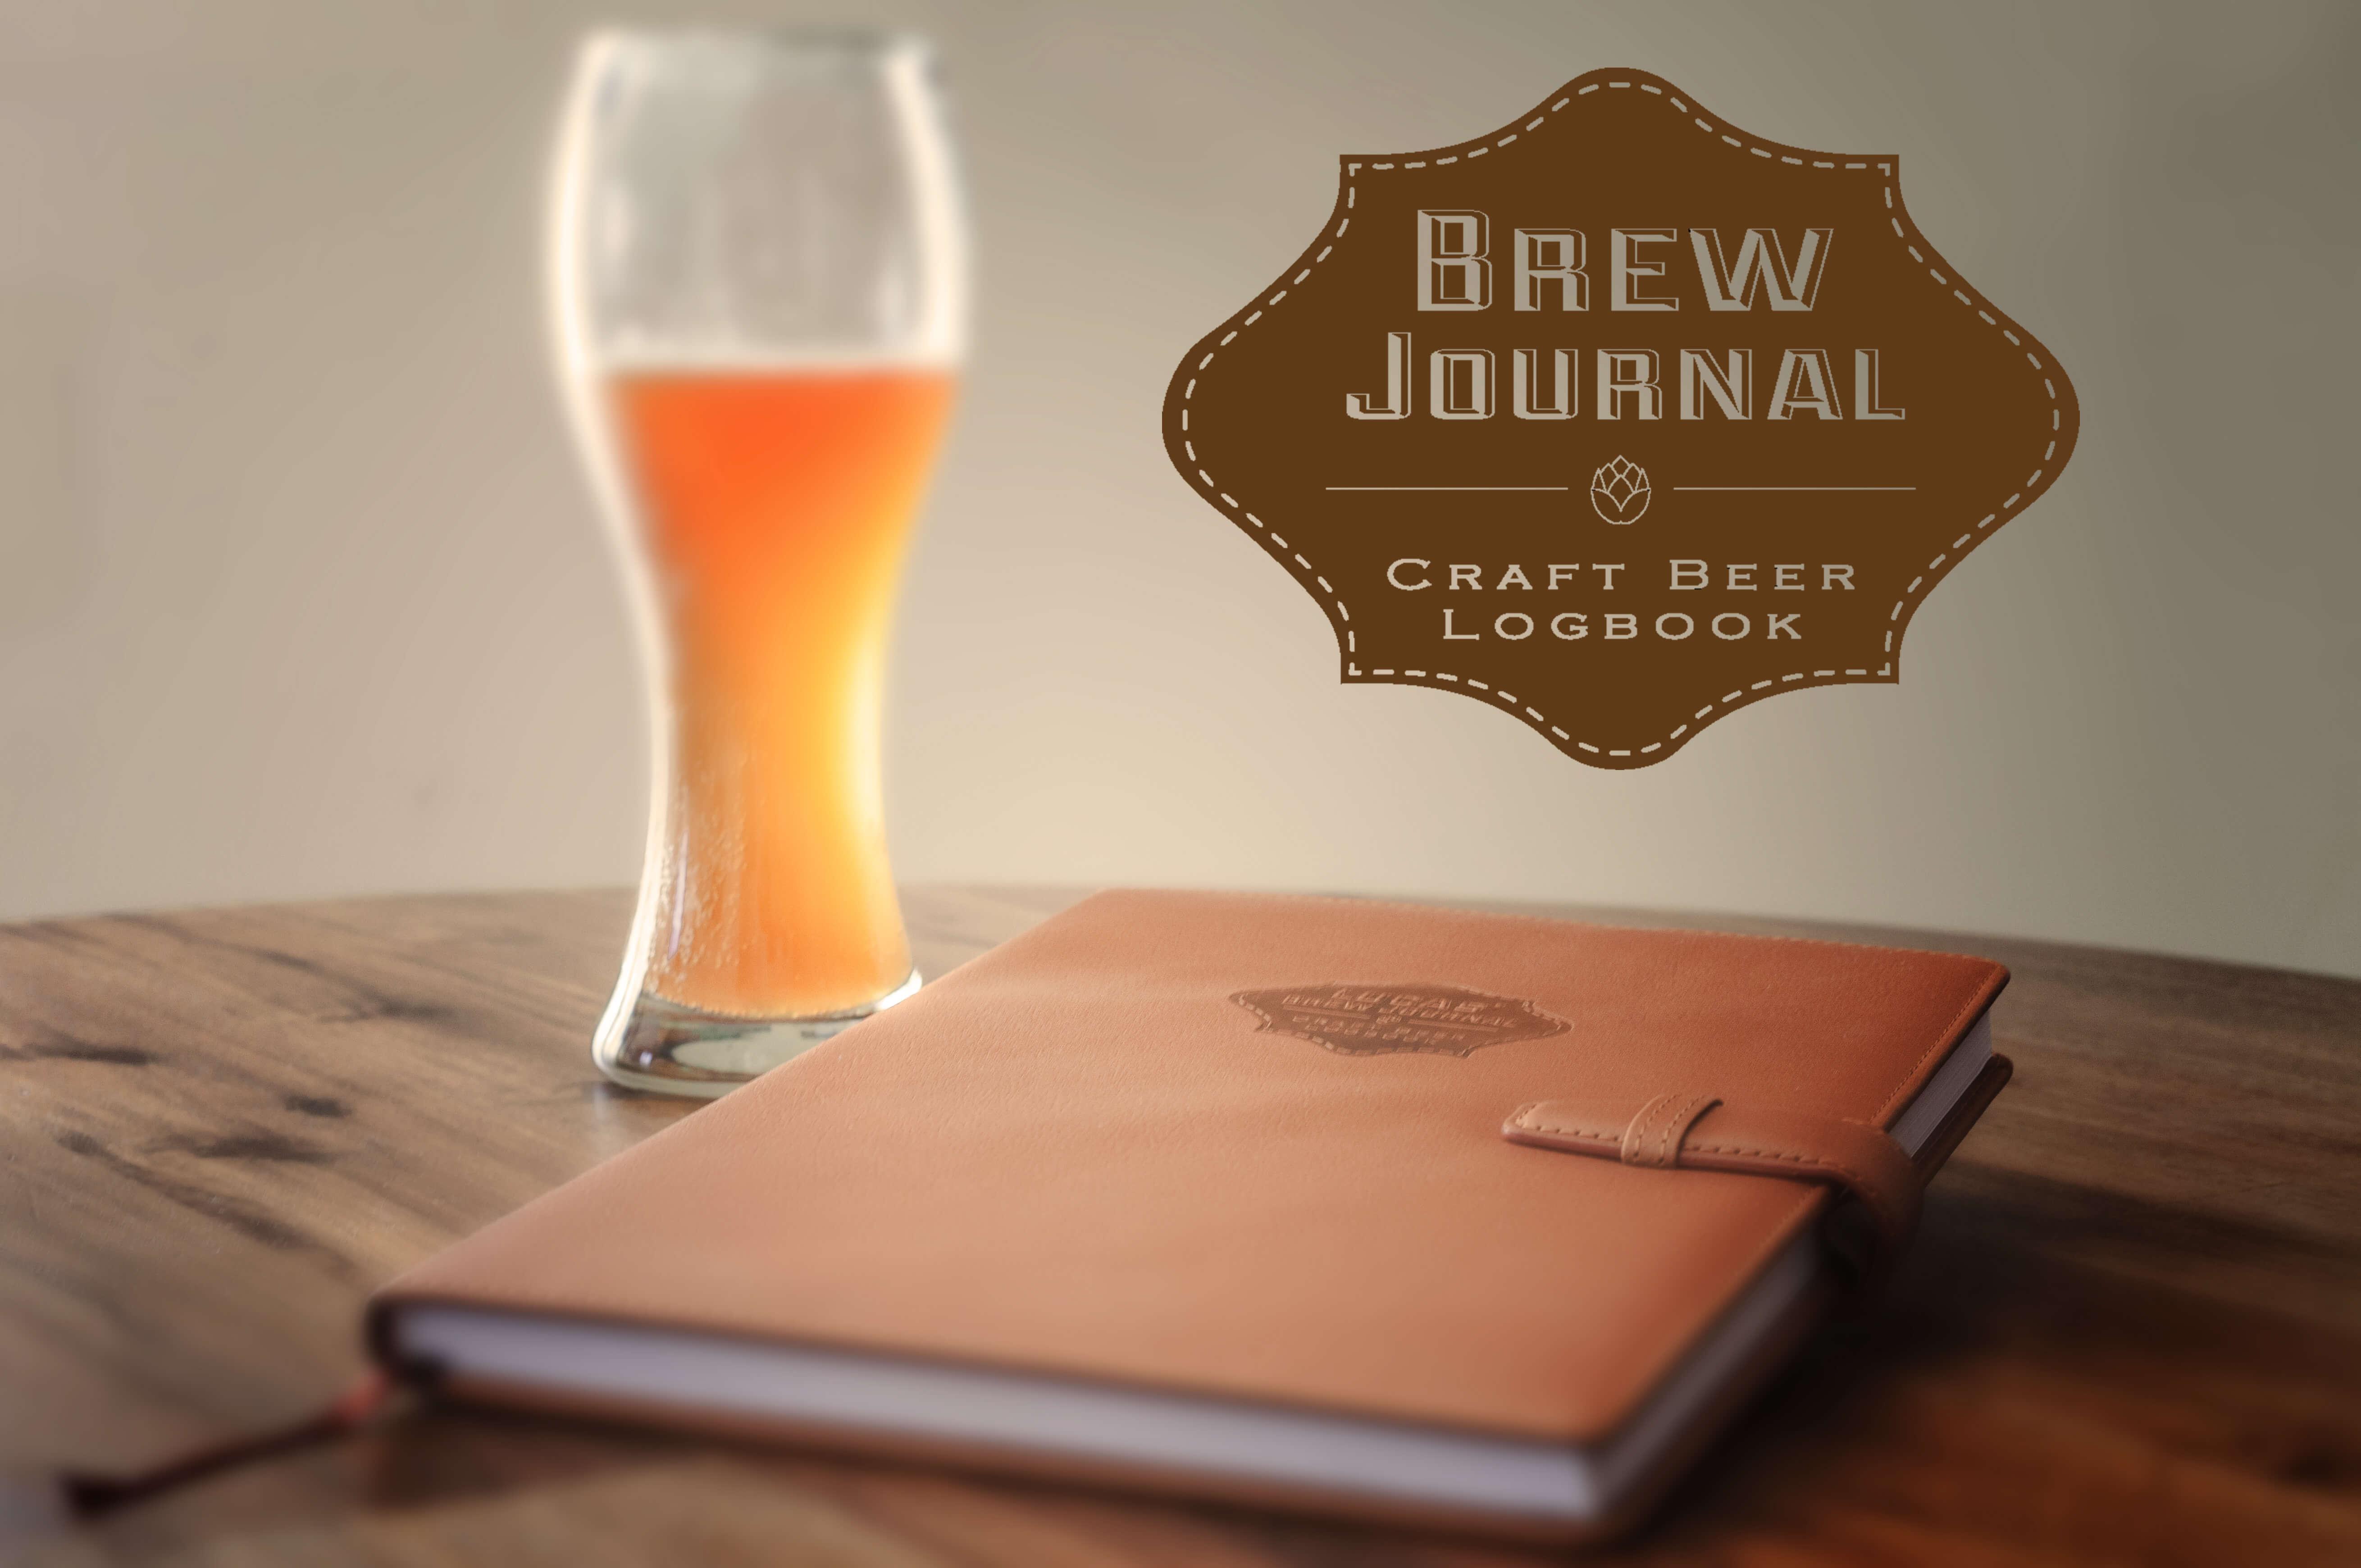 Brew journal craft beer recipes journal for Take craft beer back